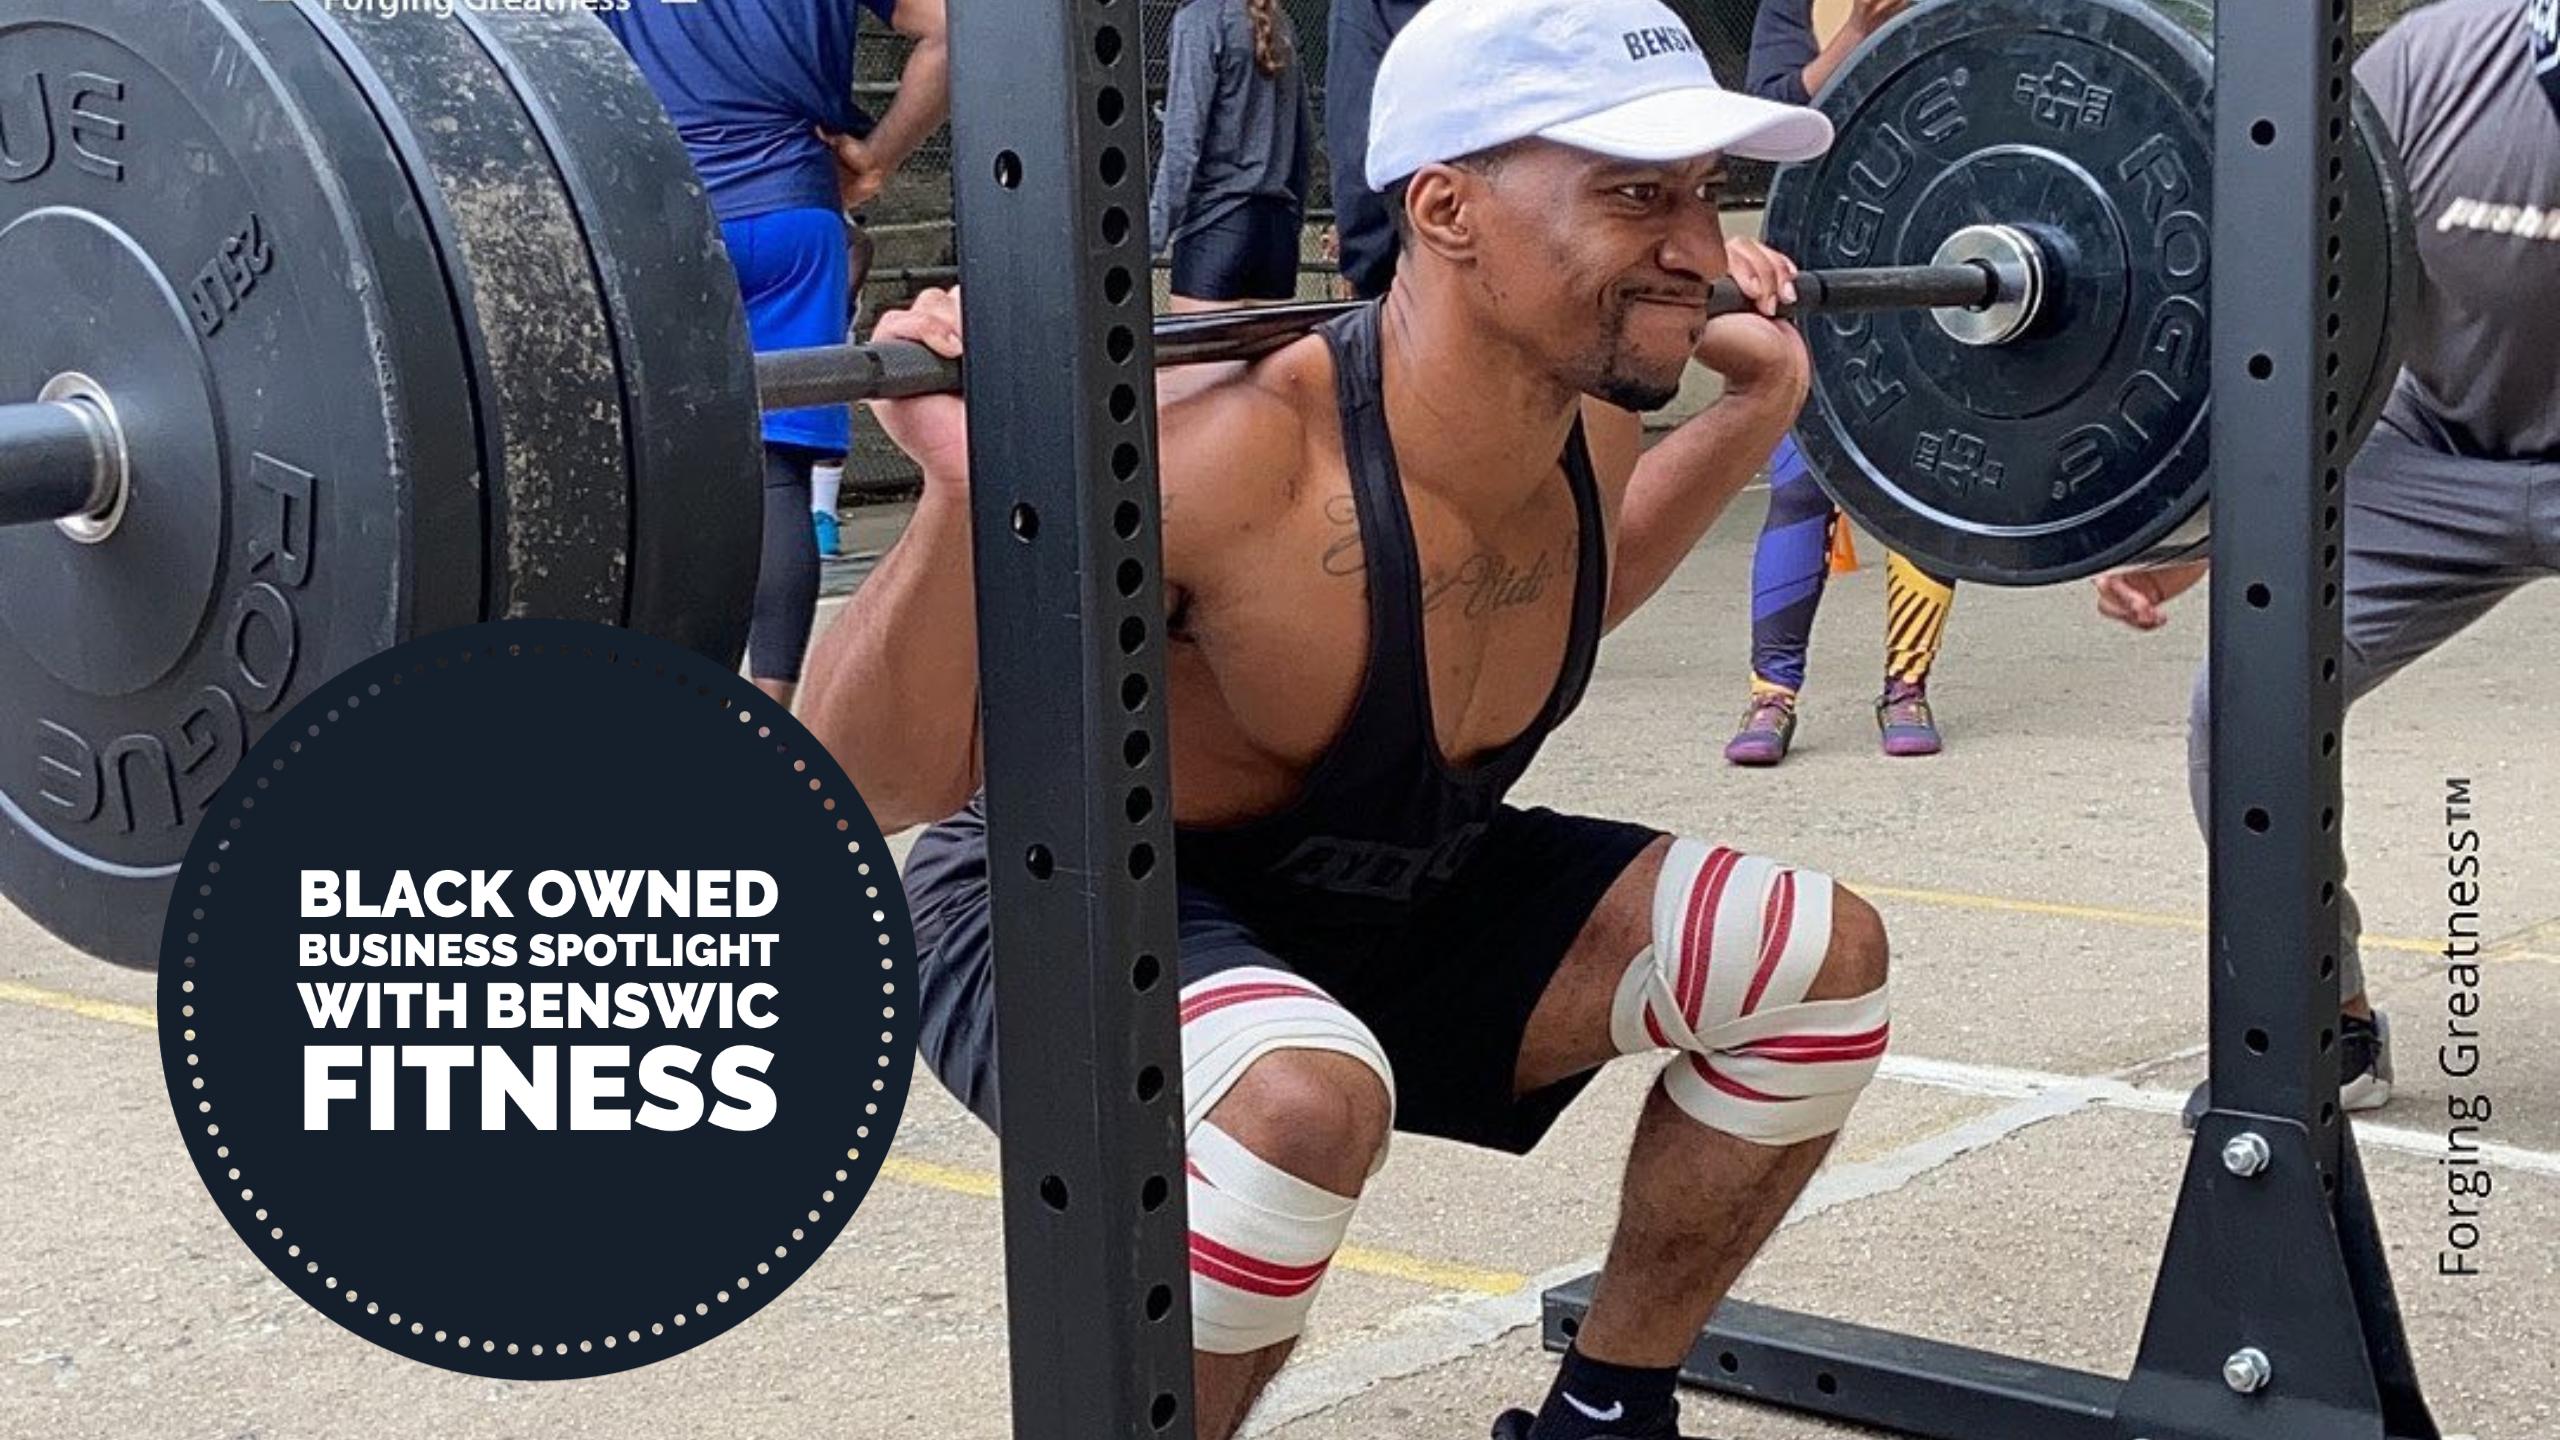 Black Business Spotlight with Benswic Fitness